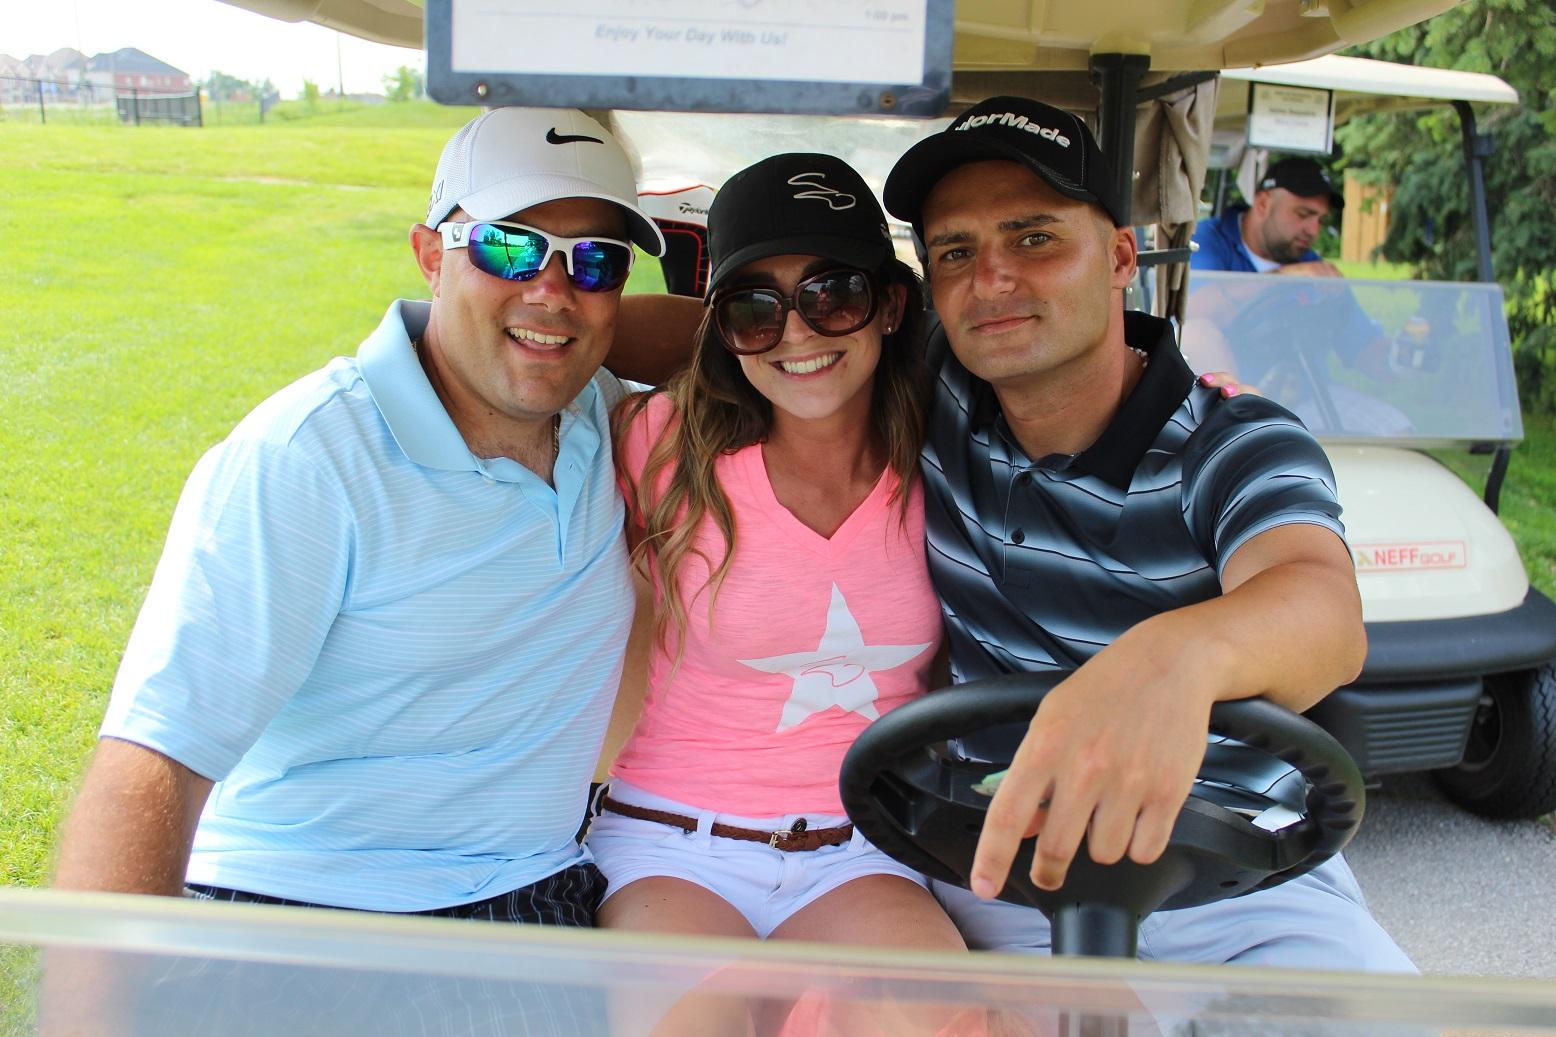 EddieO's Golf guests 38.jpg